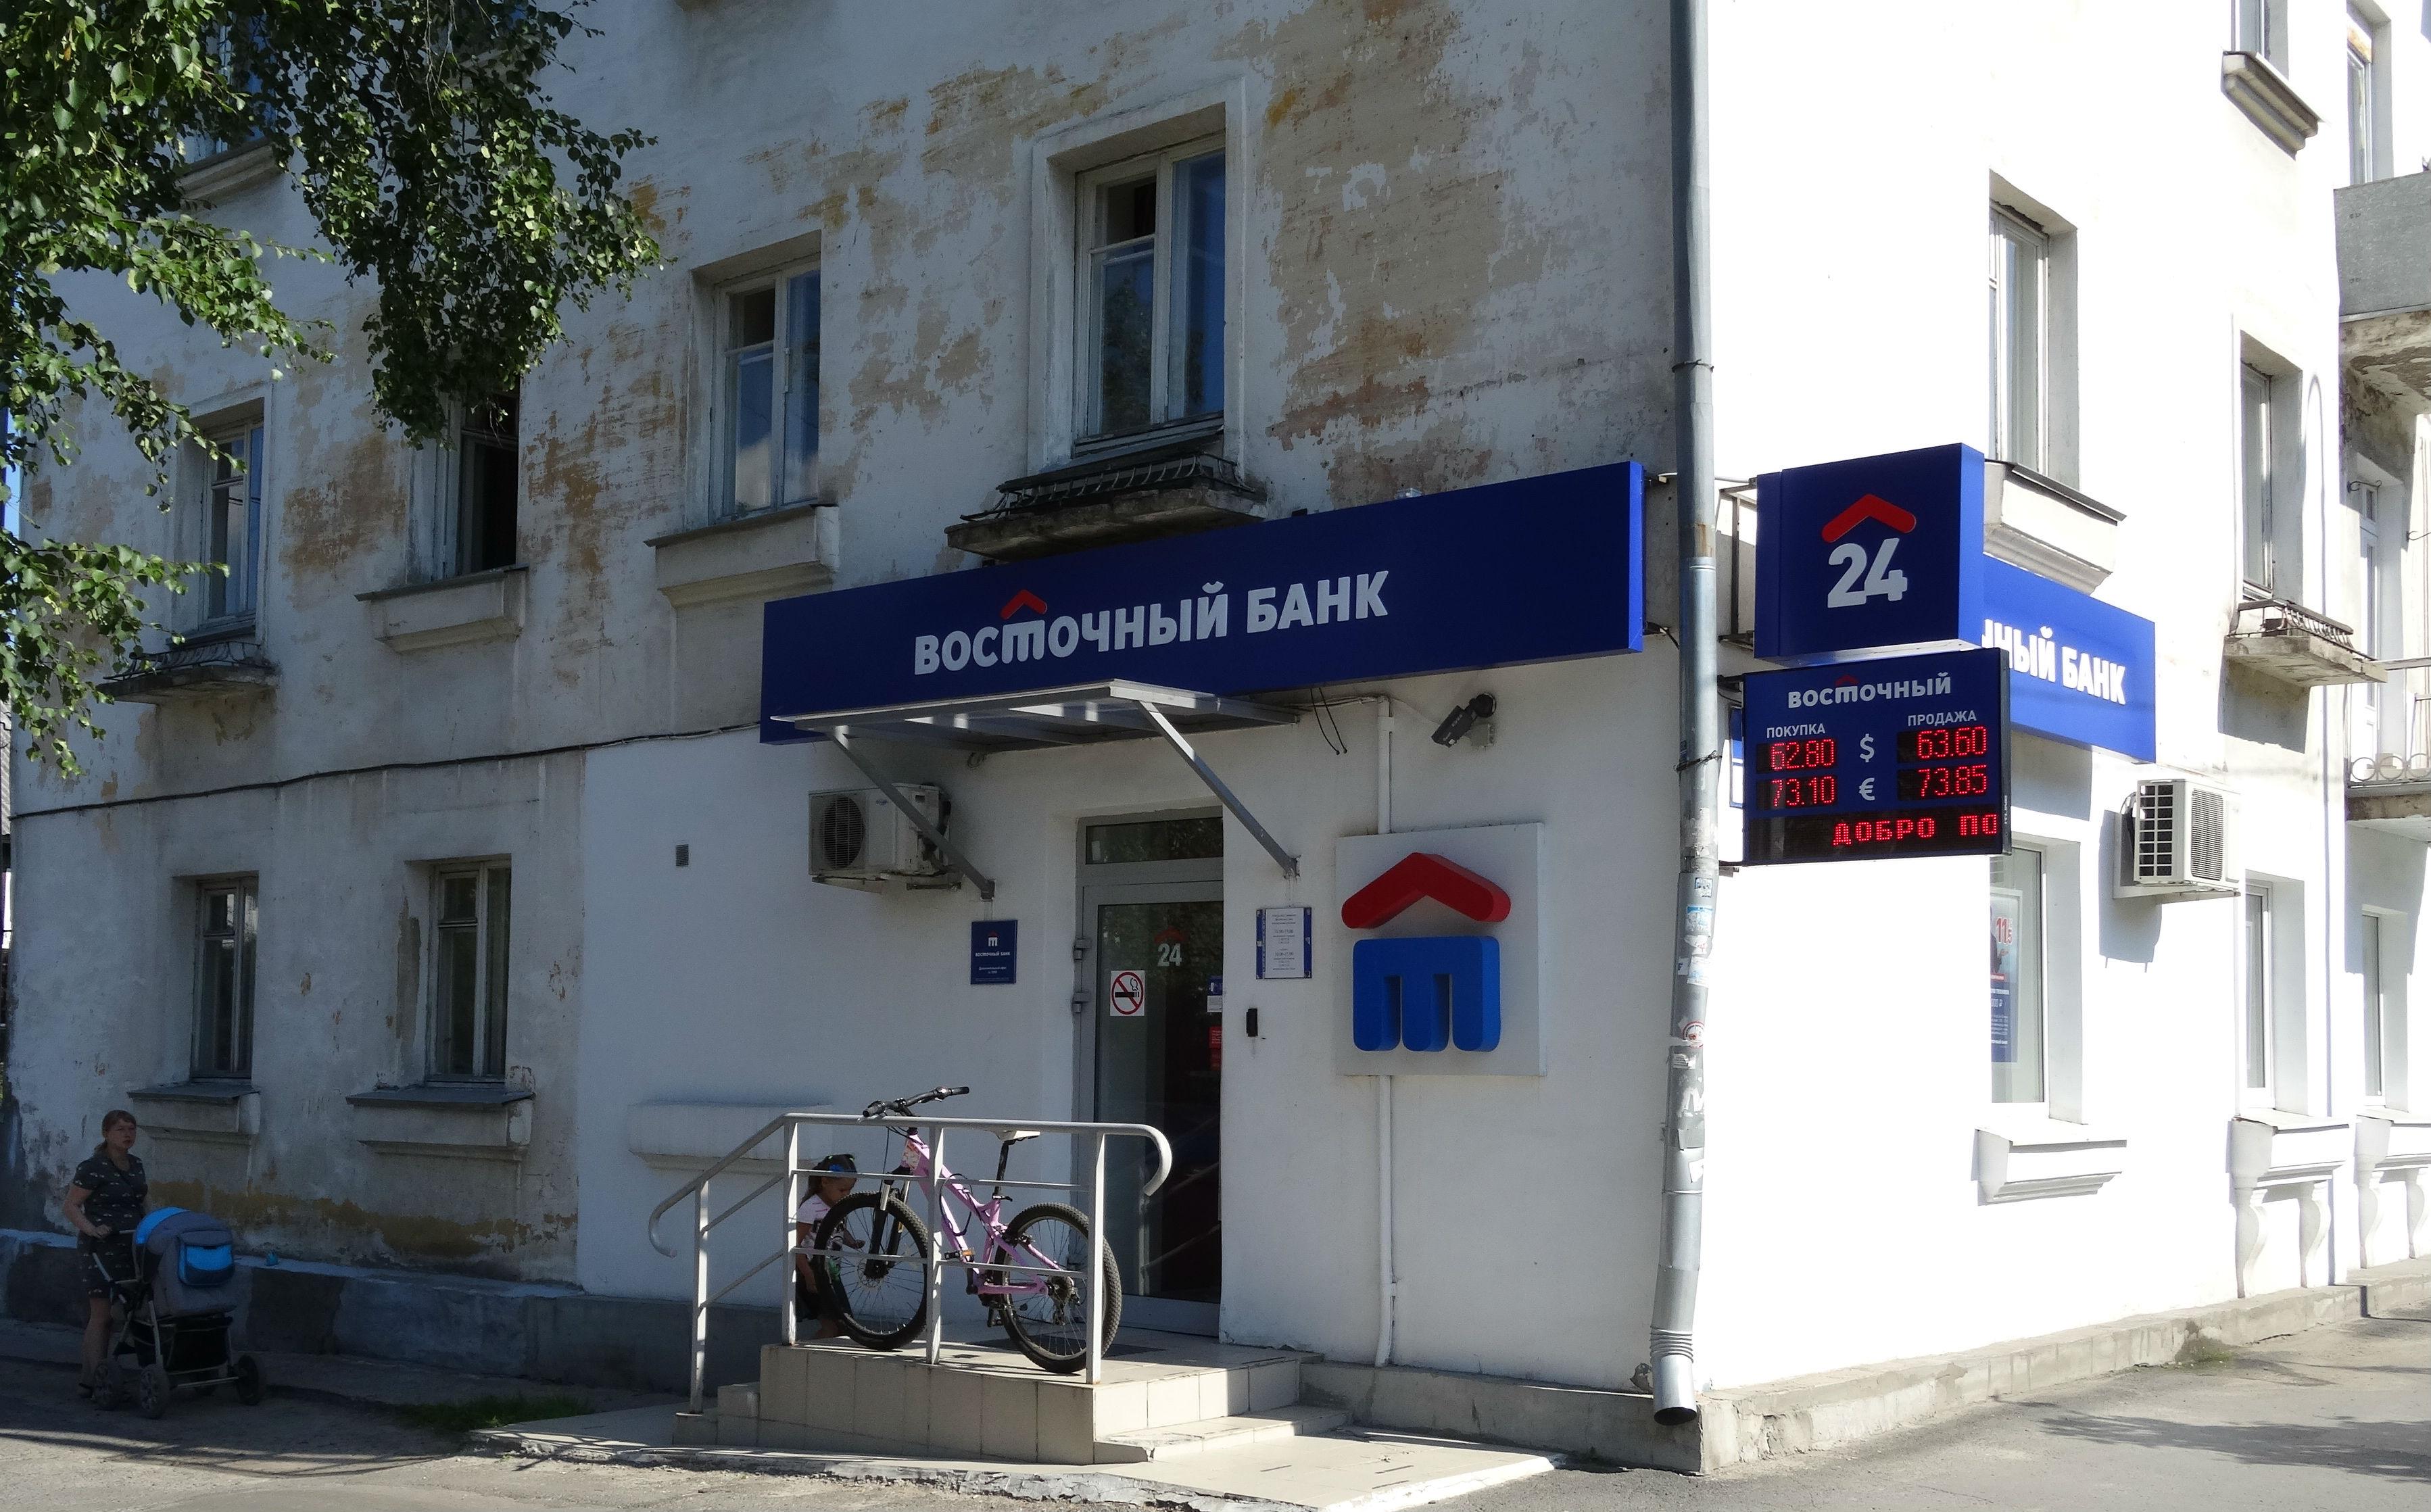 оплата кредита в восточном банке без комиссии онлайн через банковскую карту